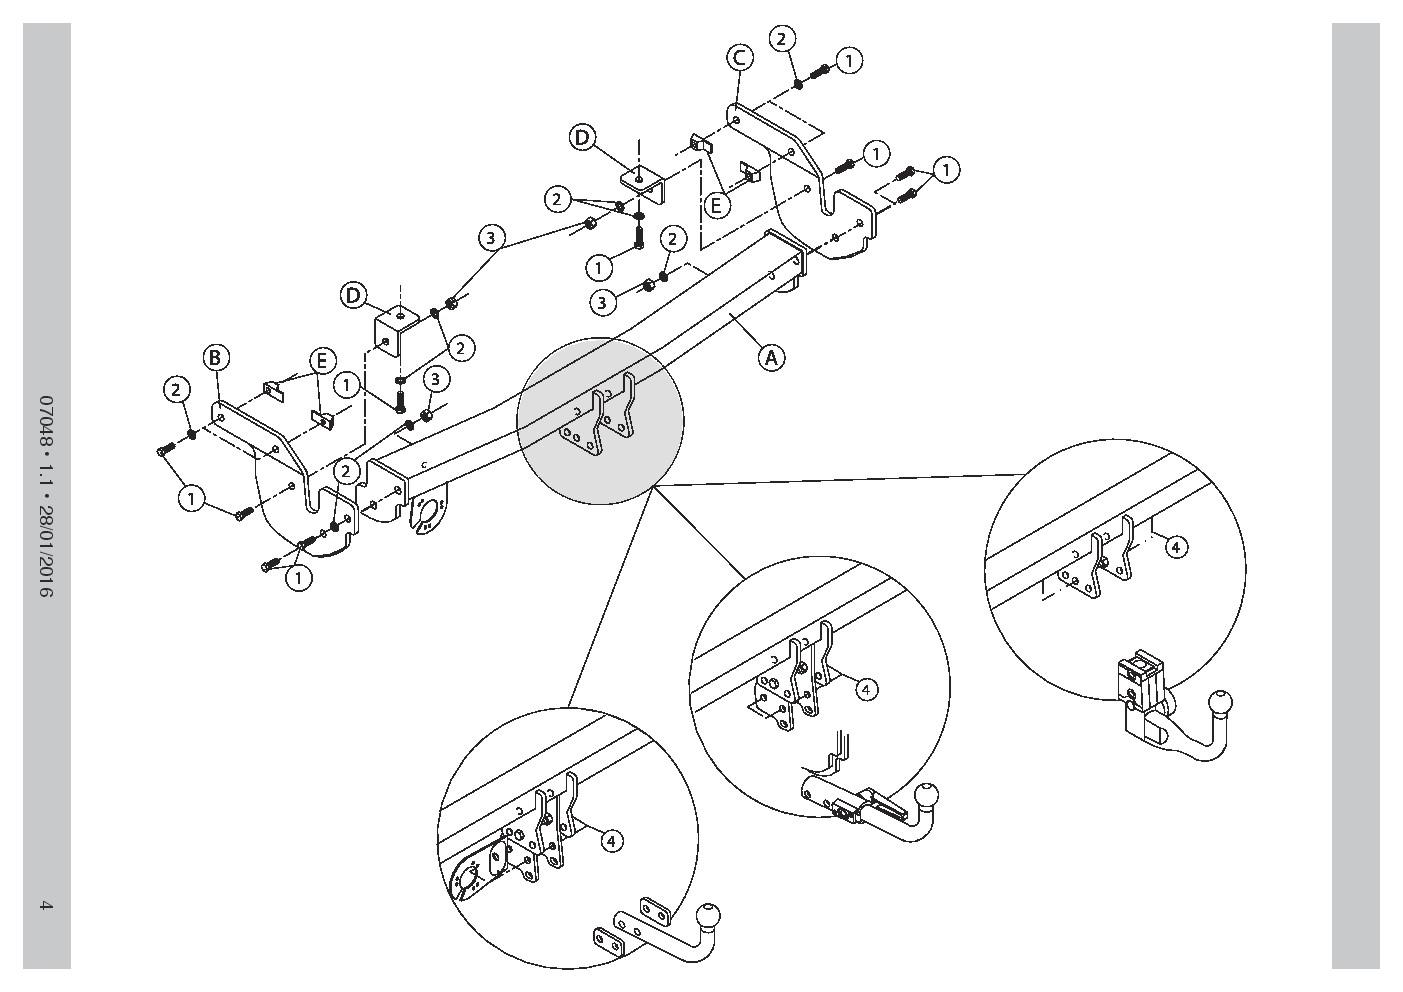 Swan Neck Towbar 7pin Electrics For Citroen C4 Cactus 2wd